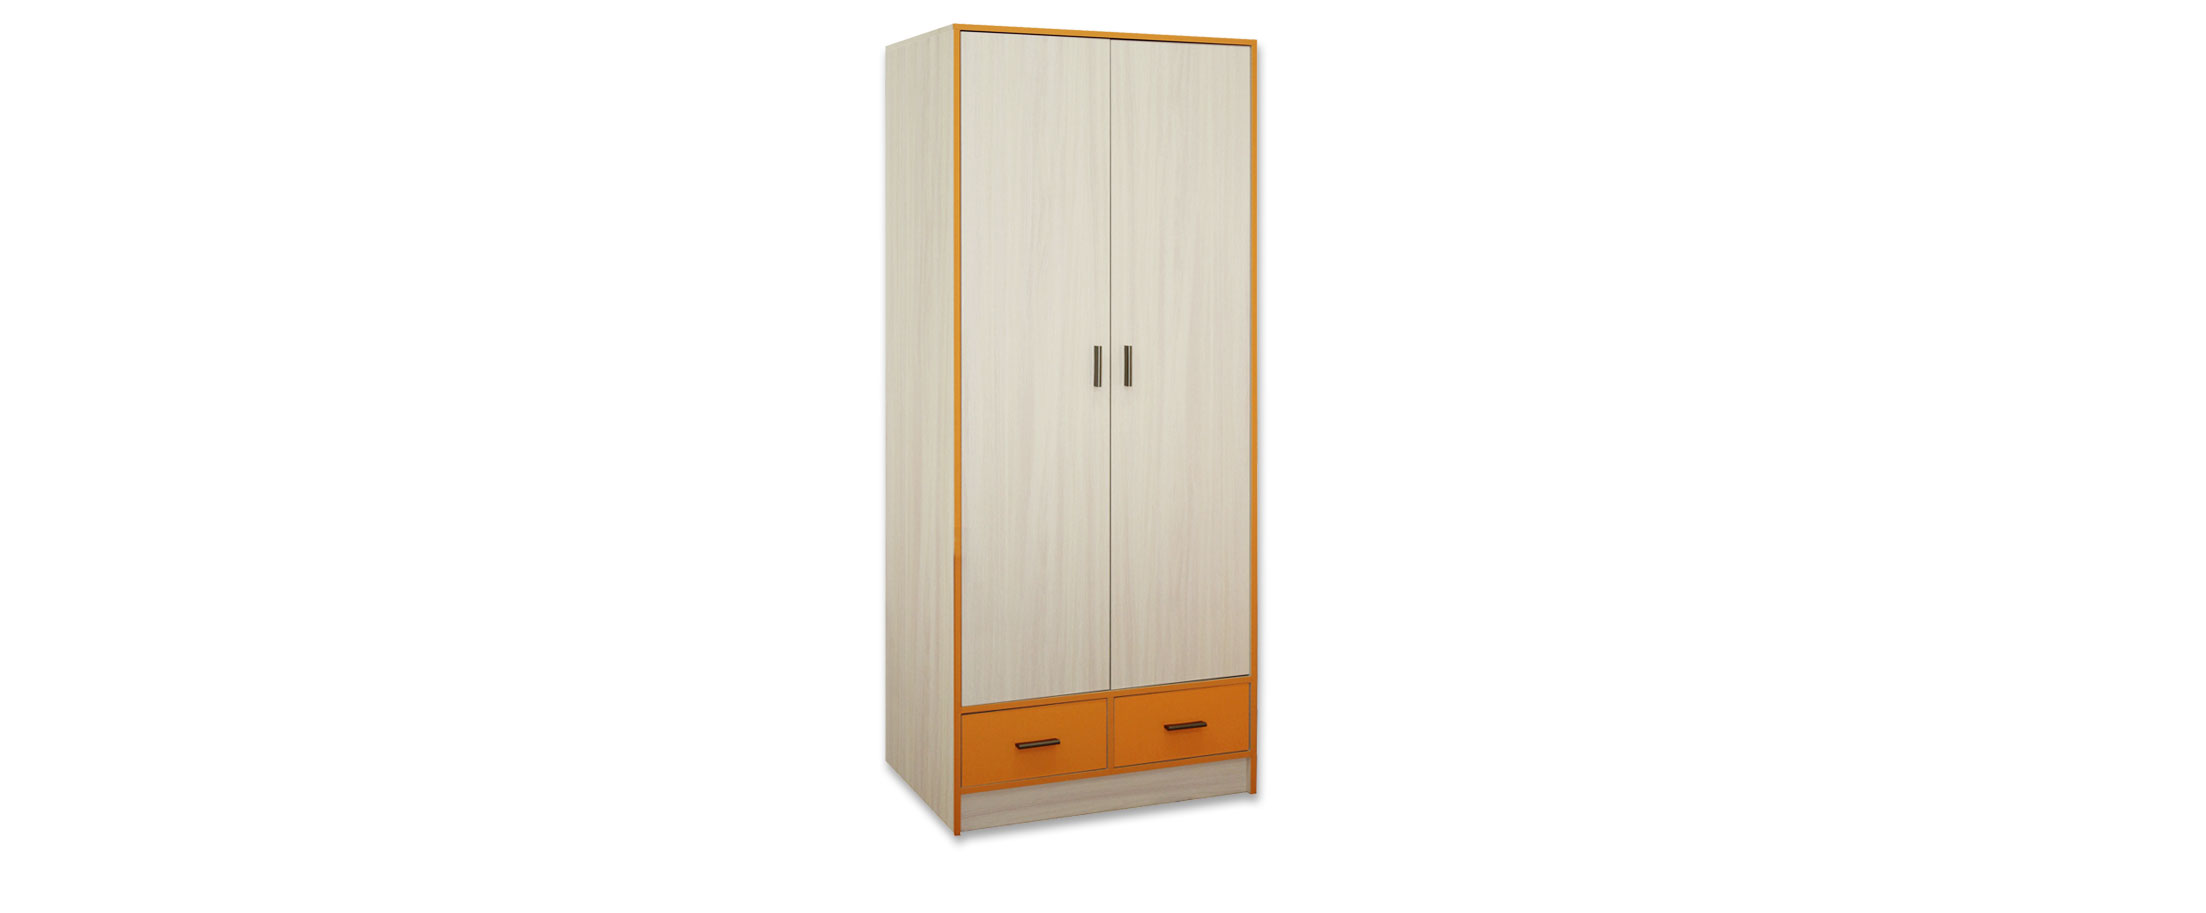 Шкаф для одежды Скейт-3 Модель 509Шкаф для одежды Скейт-3 Модель 509 артикул Ш000016<br>